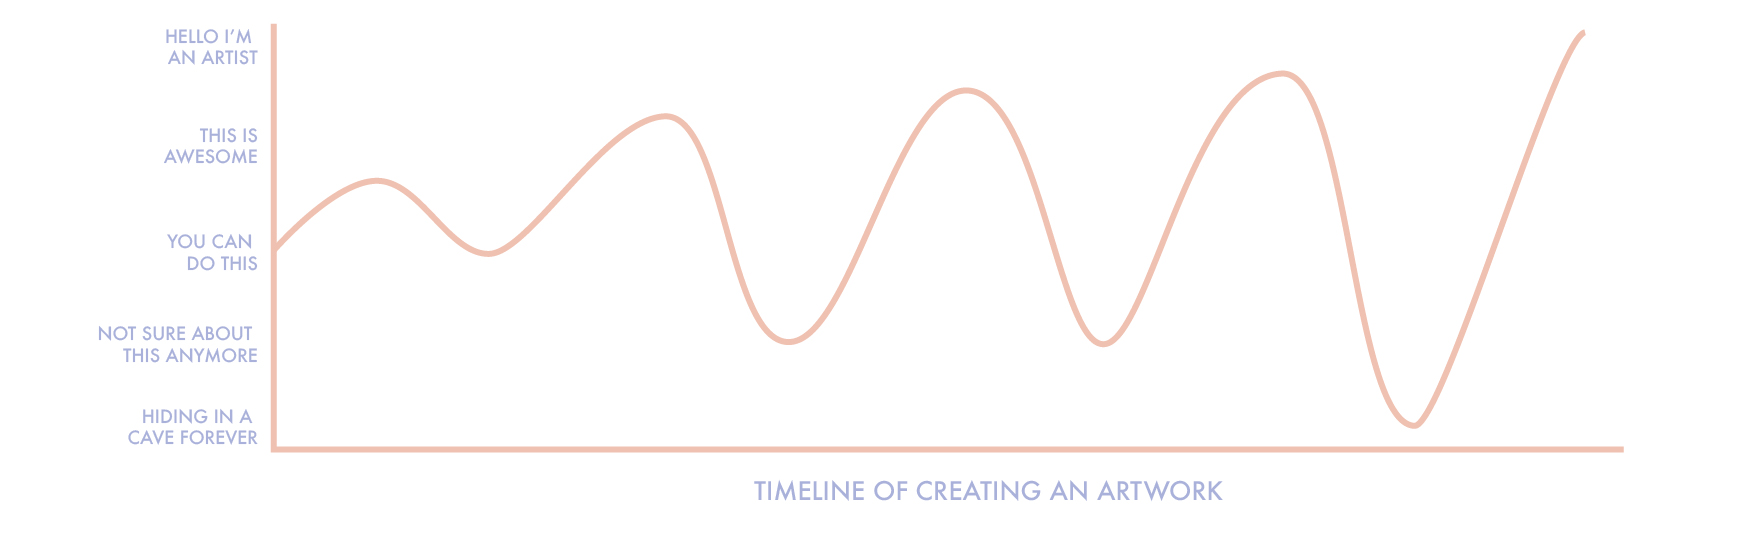 Creative_Process_League_Women_Painting_Design-01-03.jpg